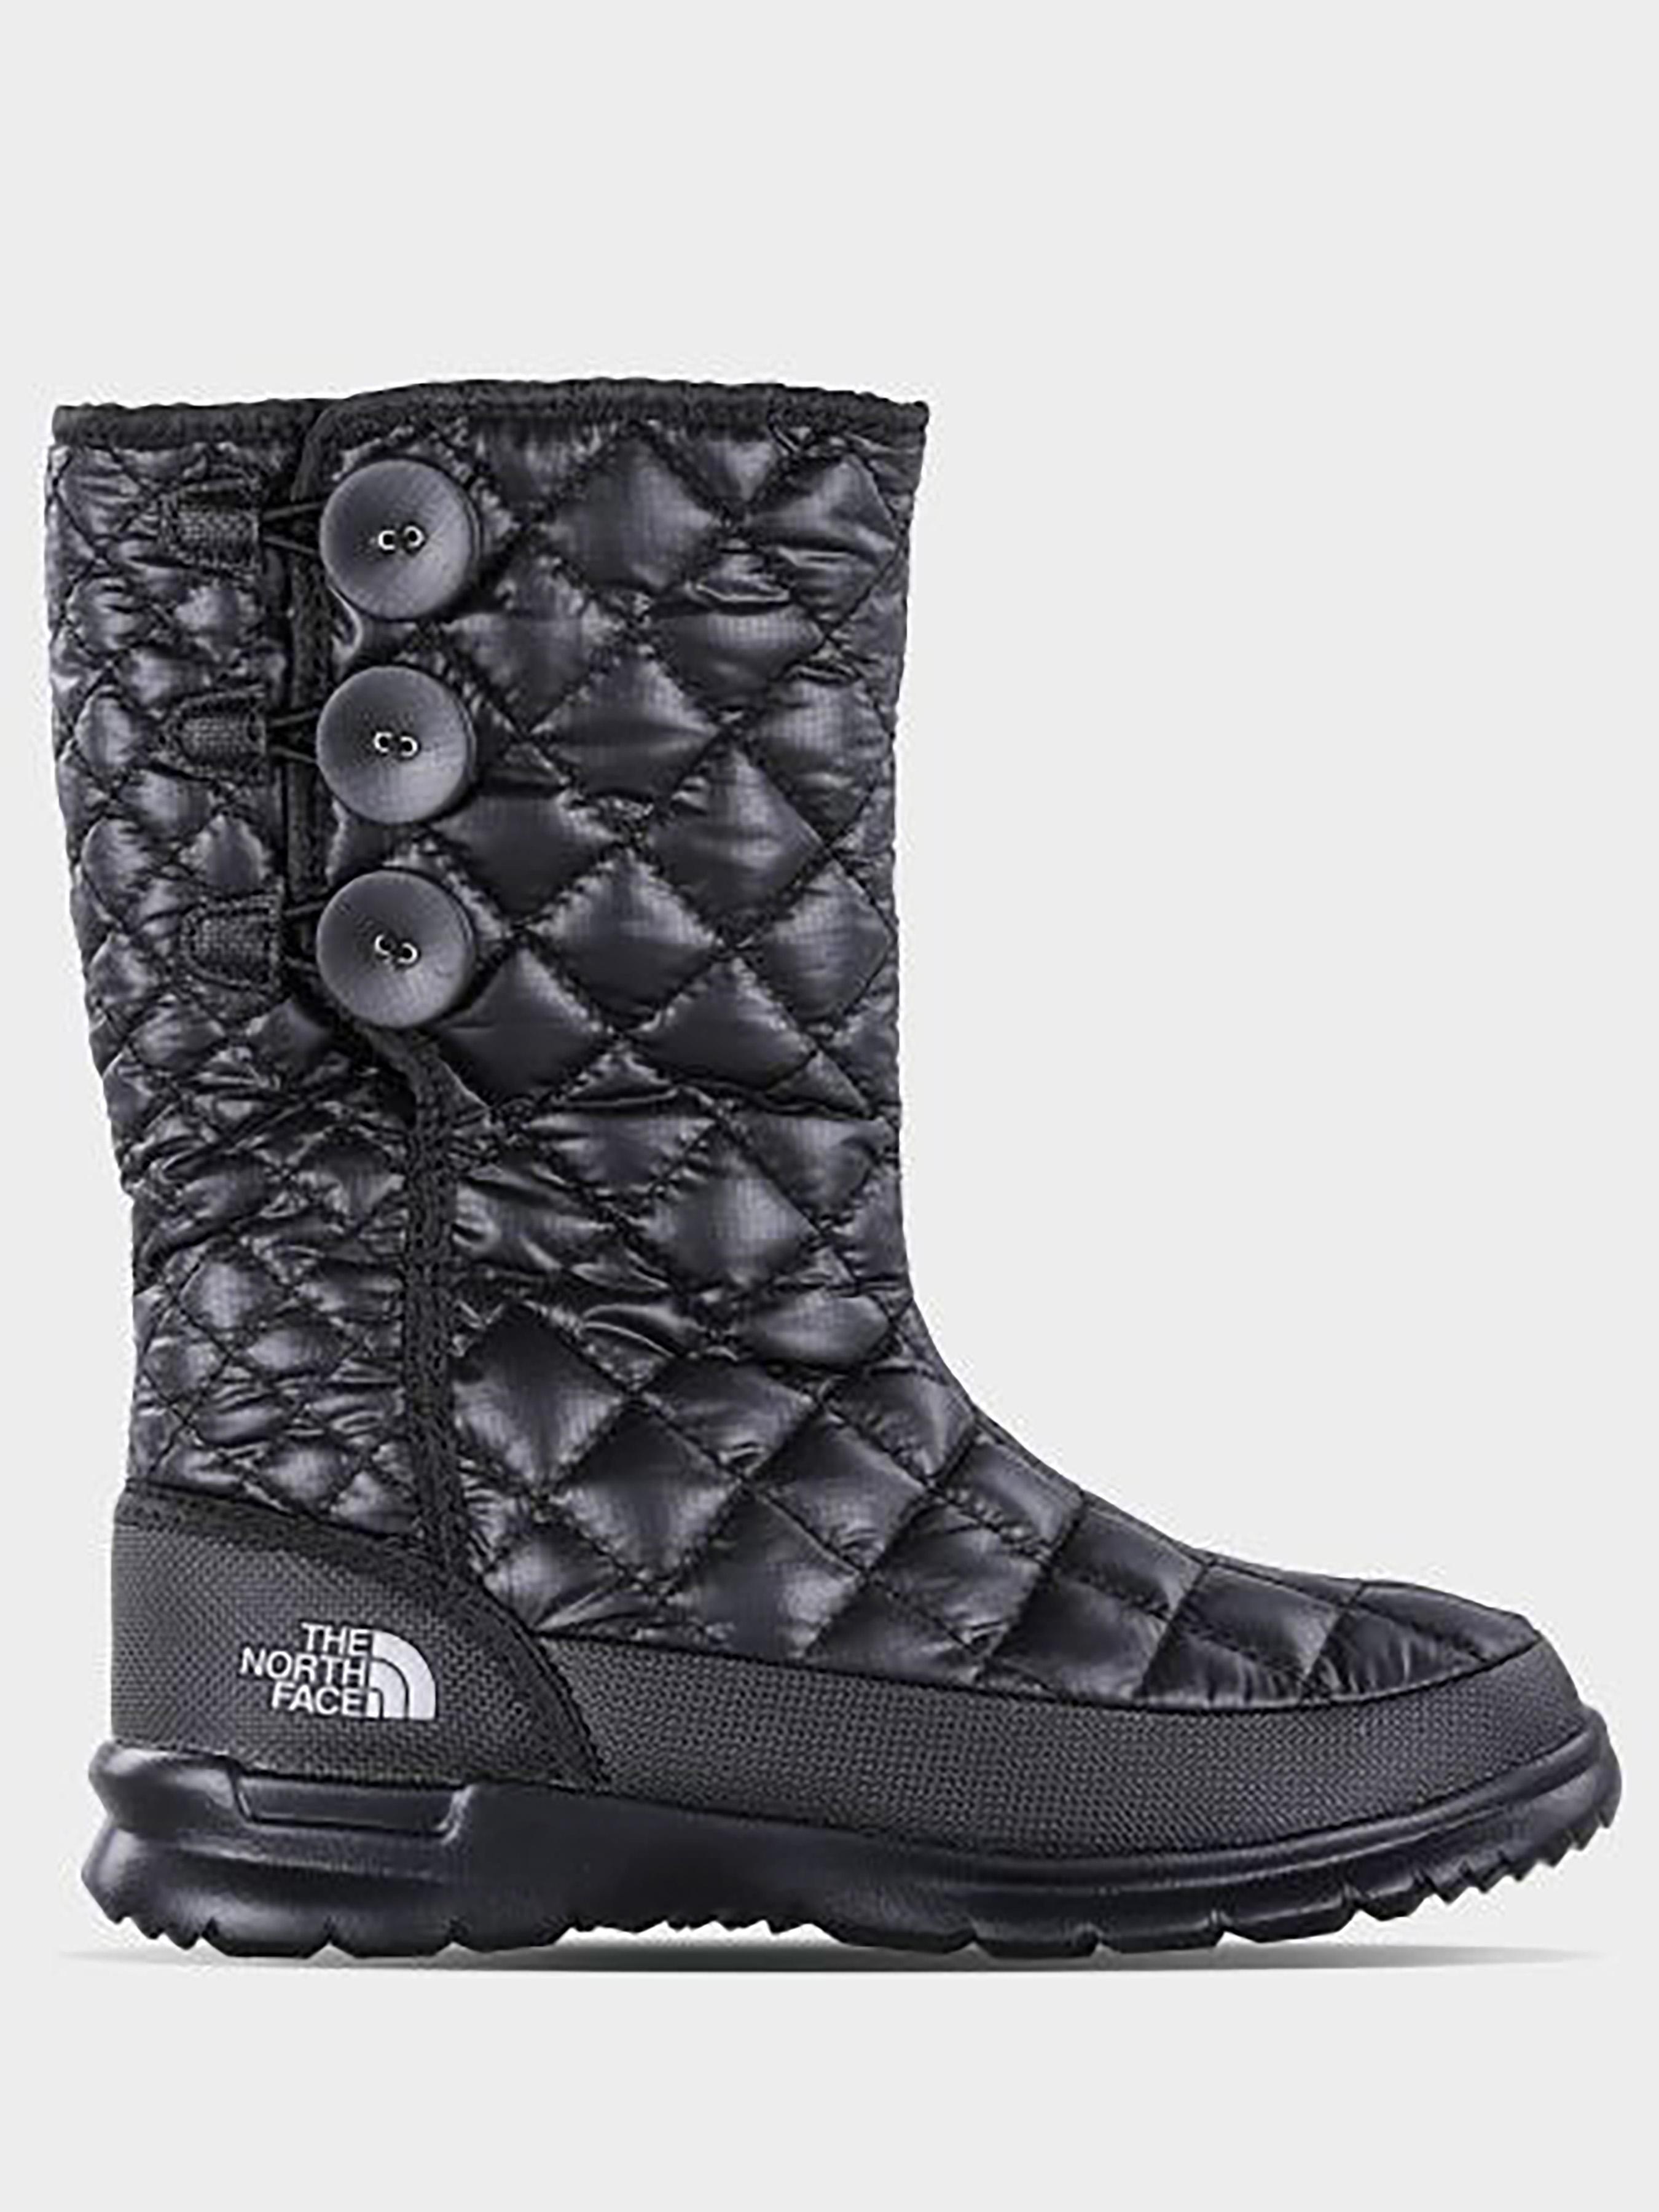 Сапоги для женщин The North Face ThermoBall™ Button-Up NO9795 брендовая обувь, 2017